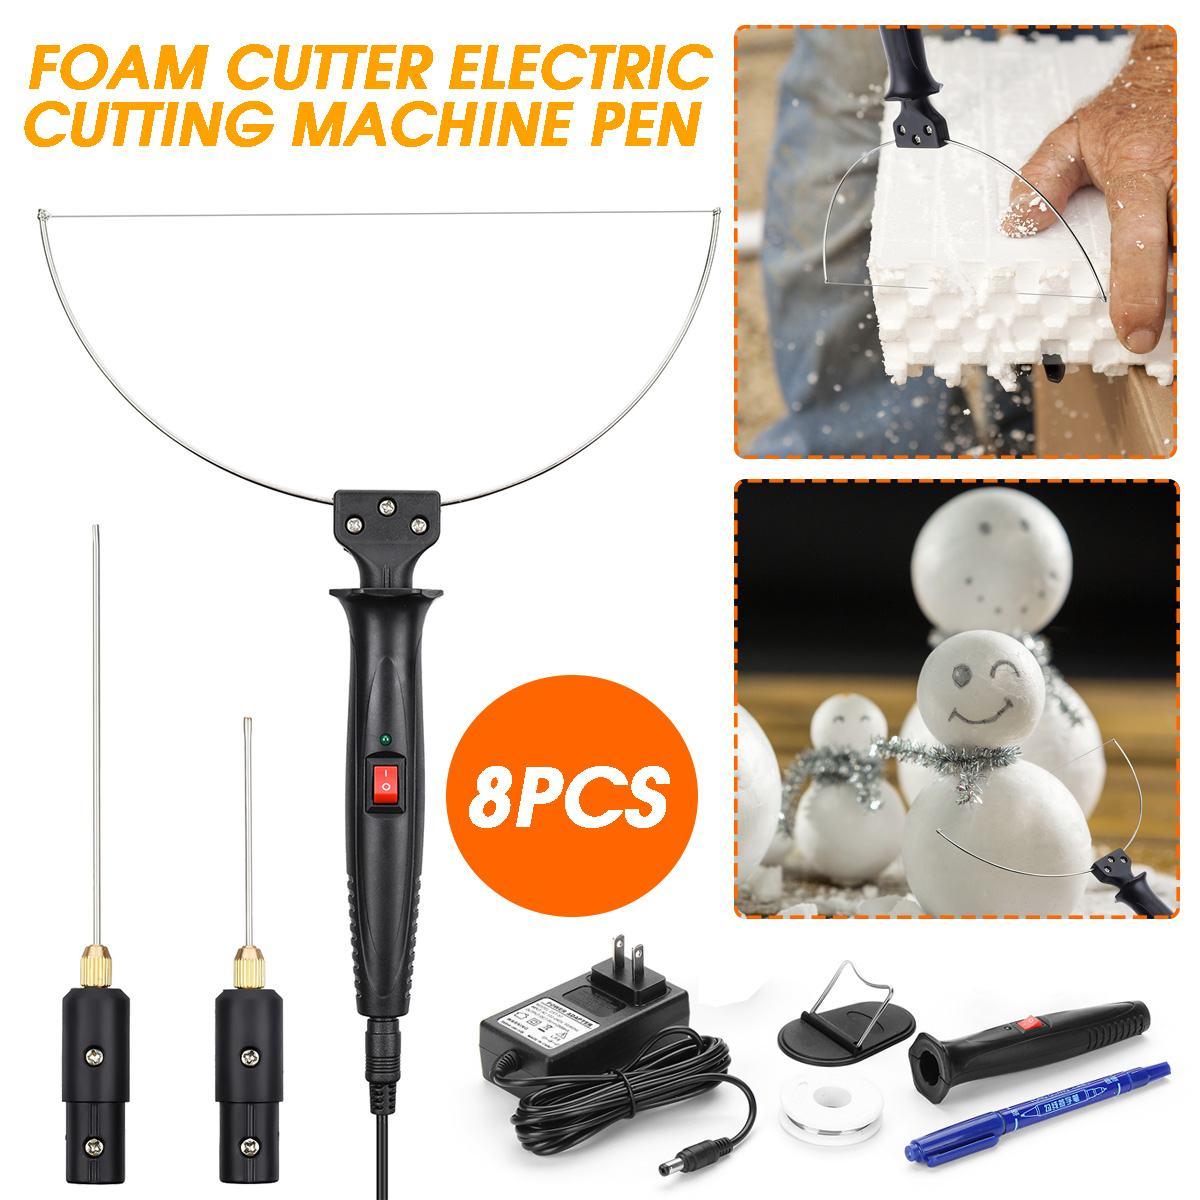 KIWARM 3 In 1 Electric Styrofoam Cutter 18W Cutting Machine Pen Tool Set Alloy Portable Foam Cutting Knife Tool Hot Heating Wire